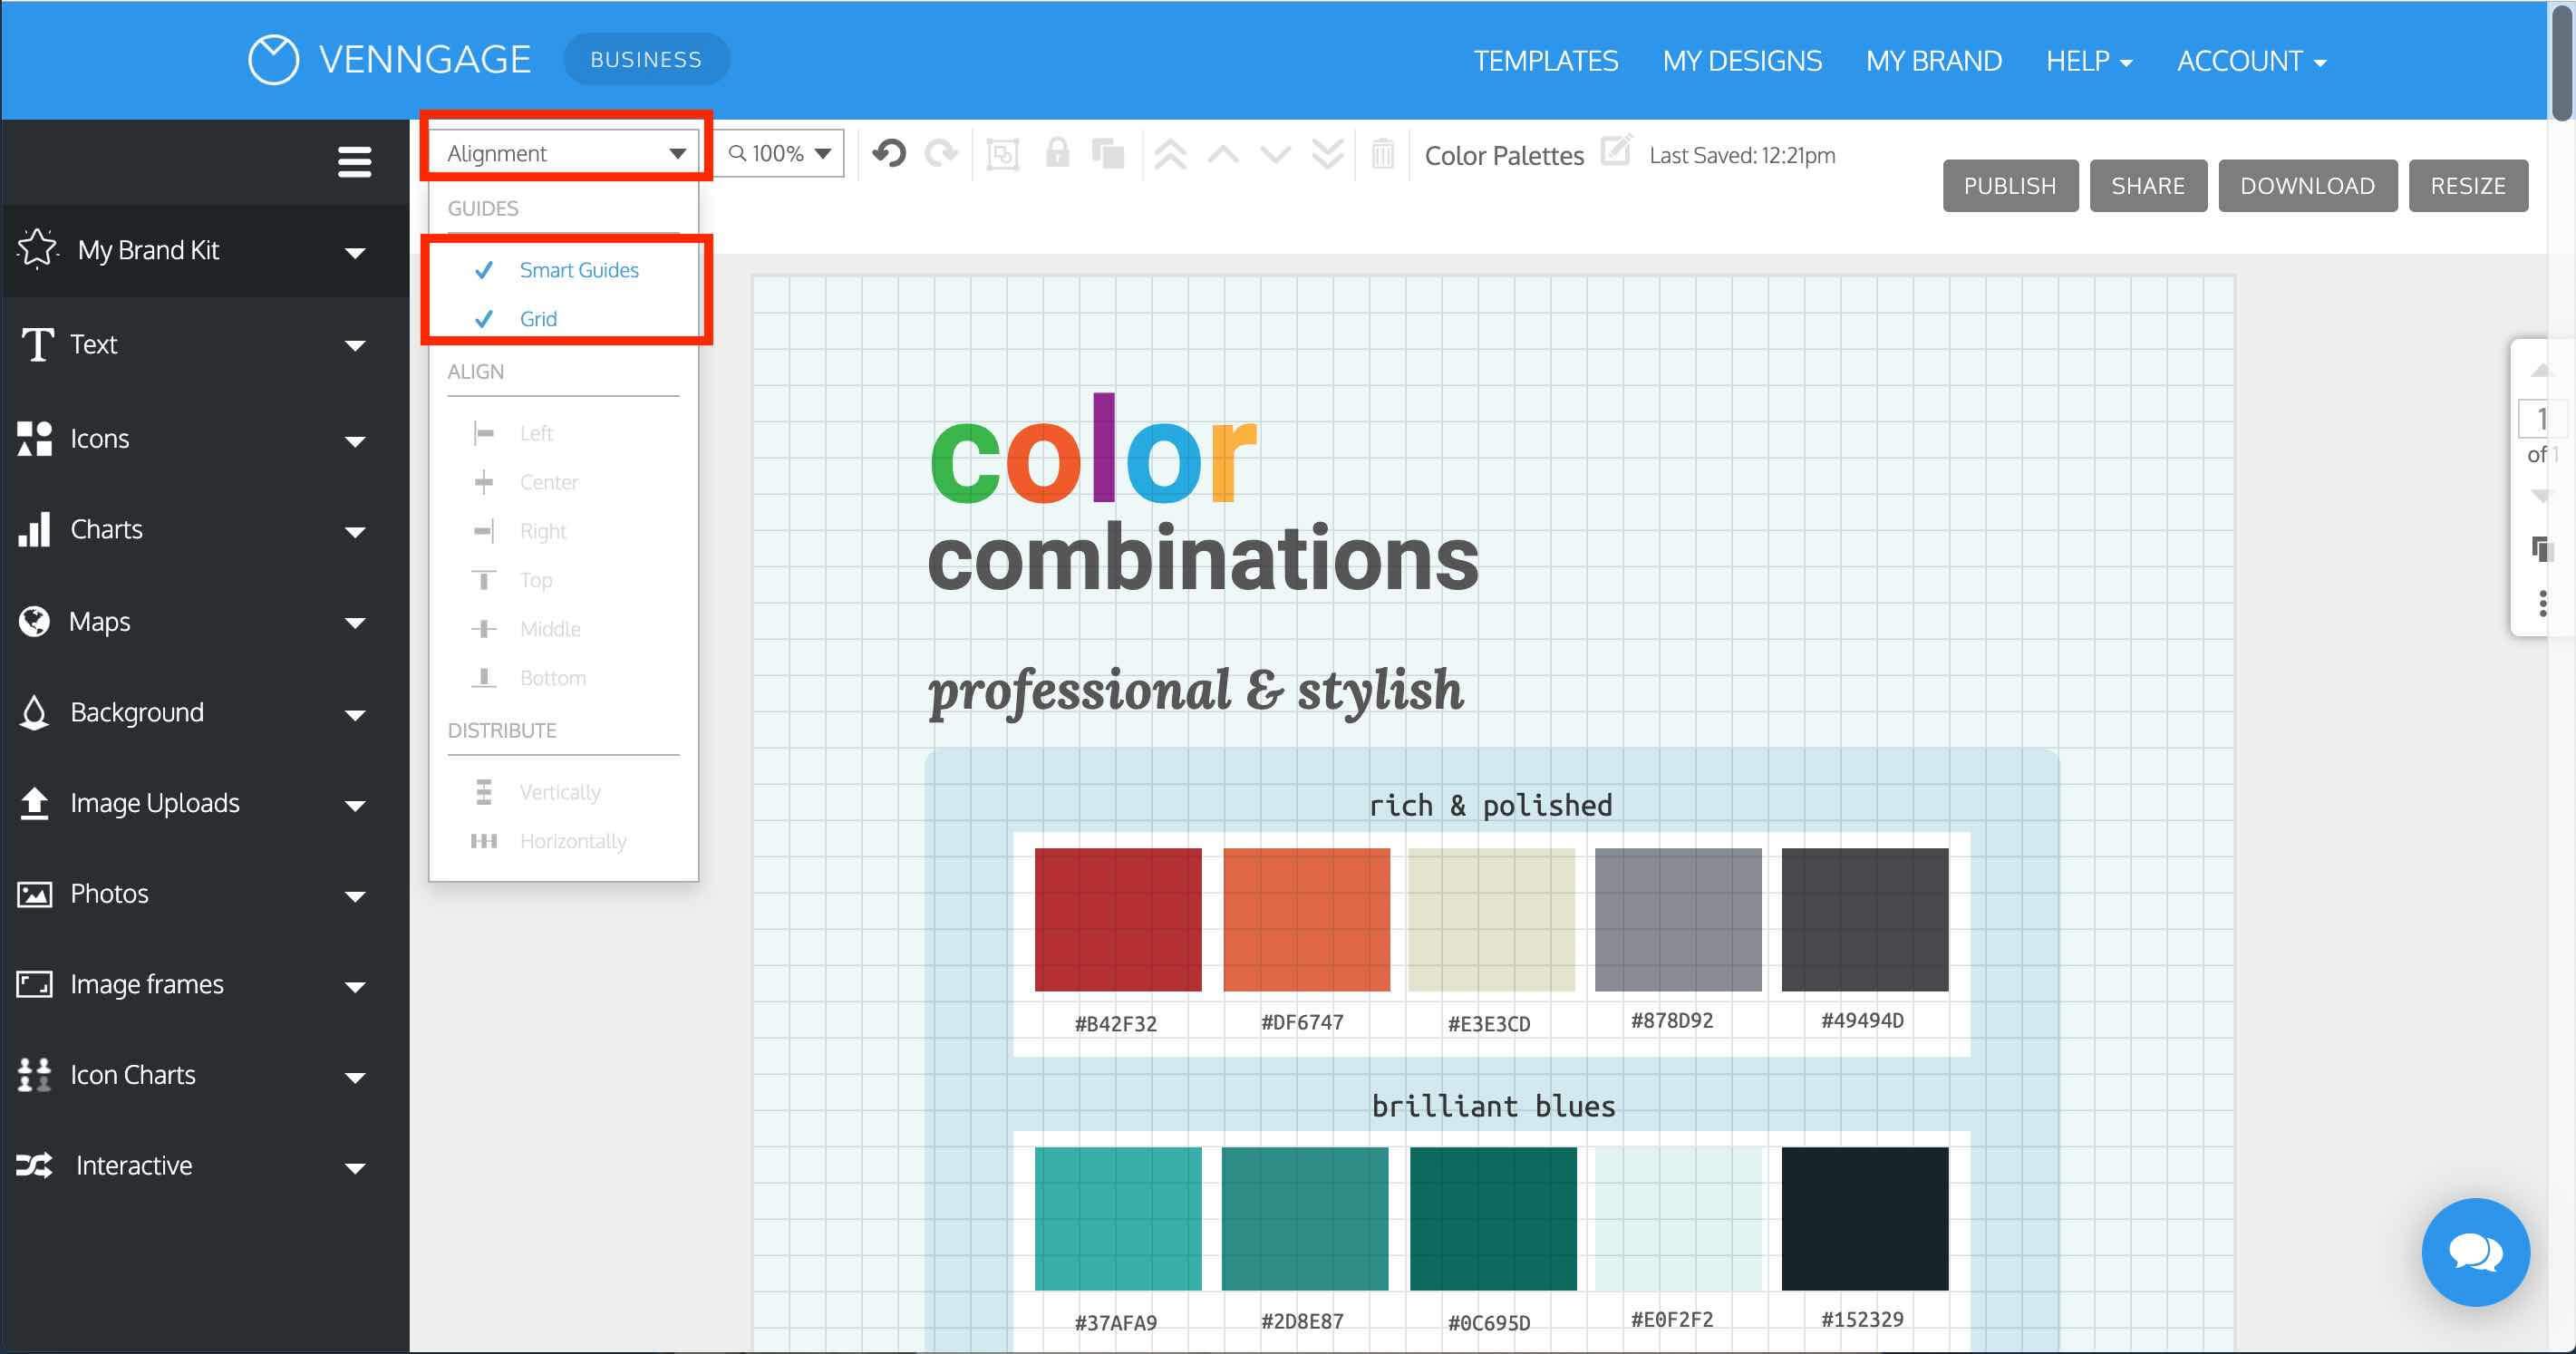 Infographic-Design-Screenshot-1